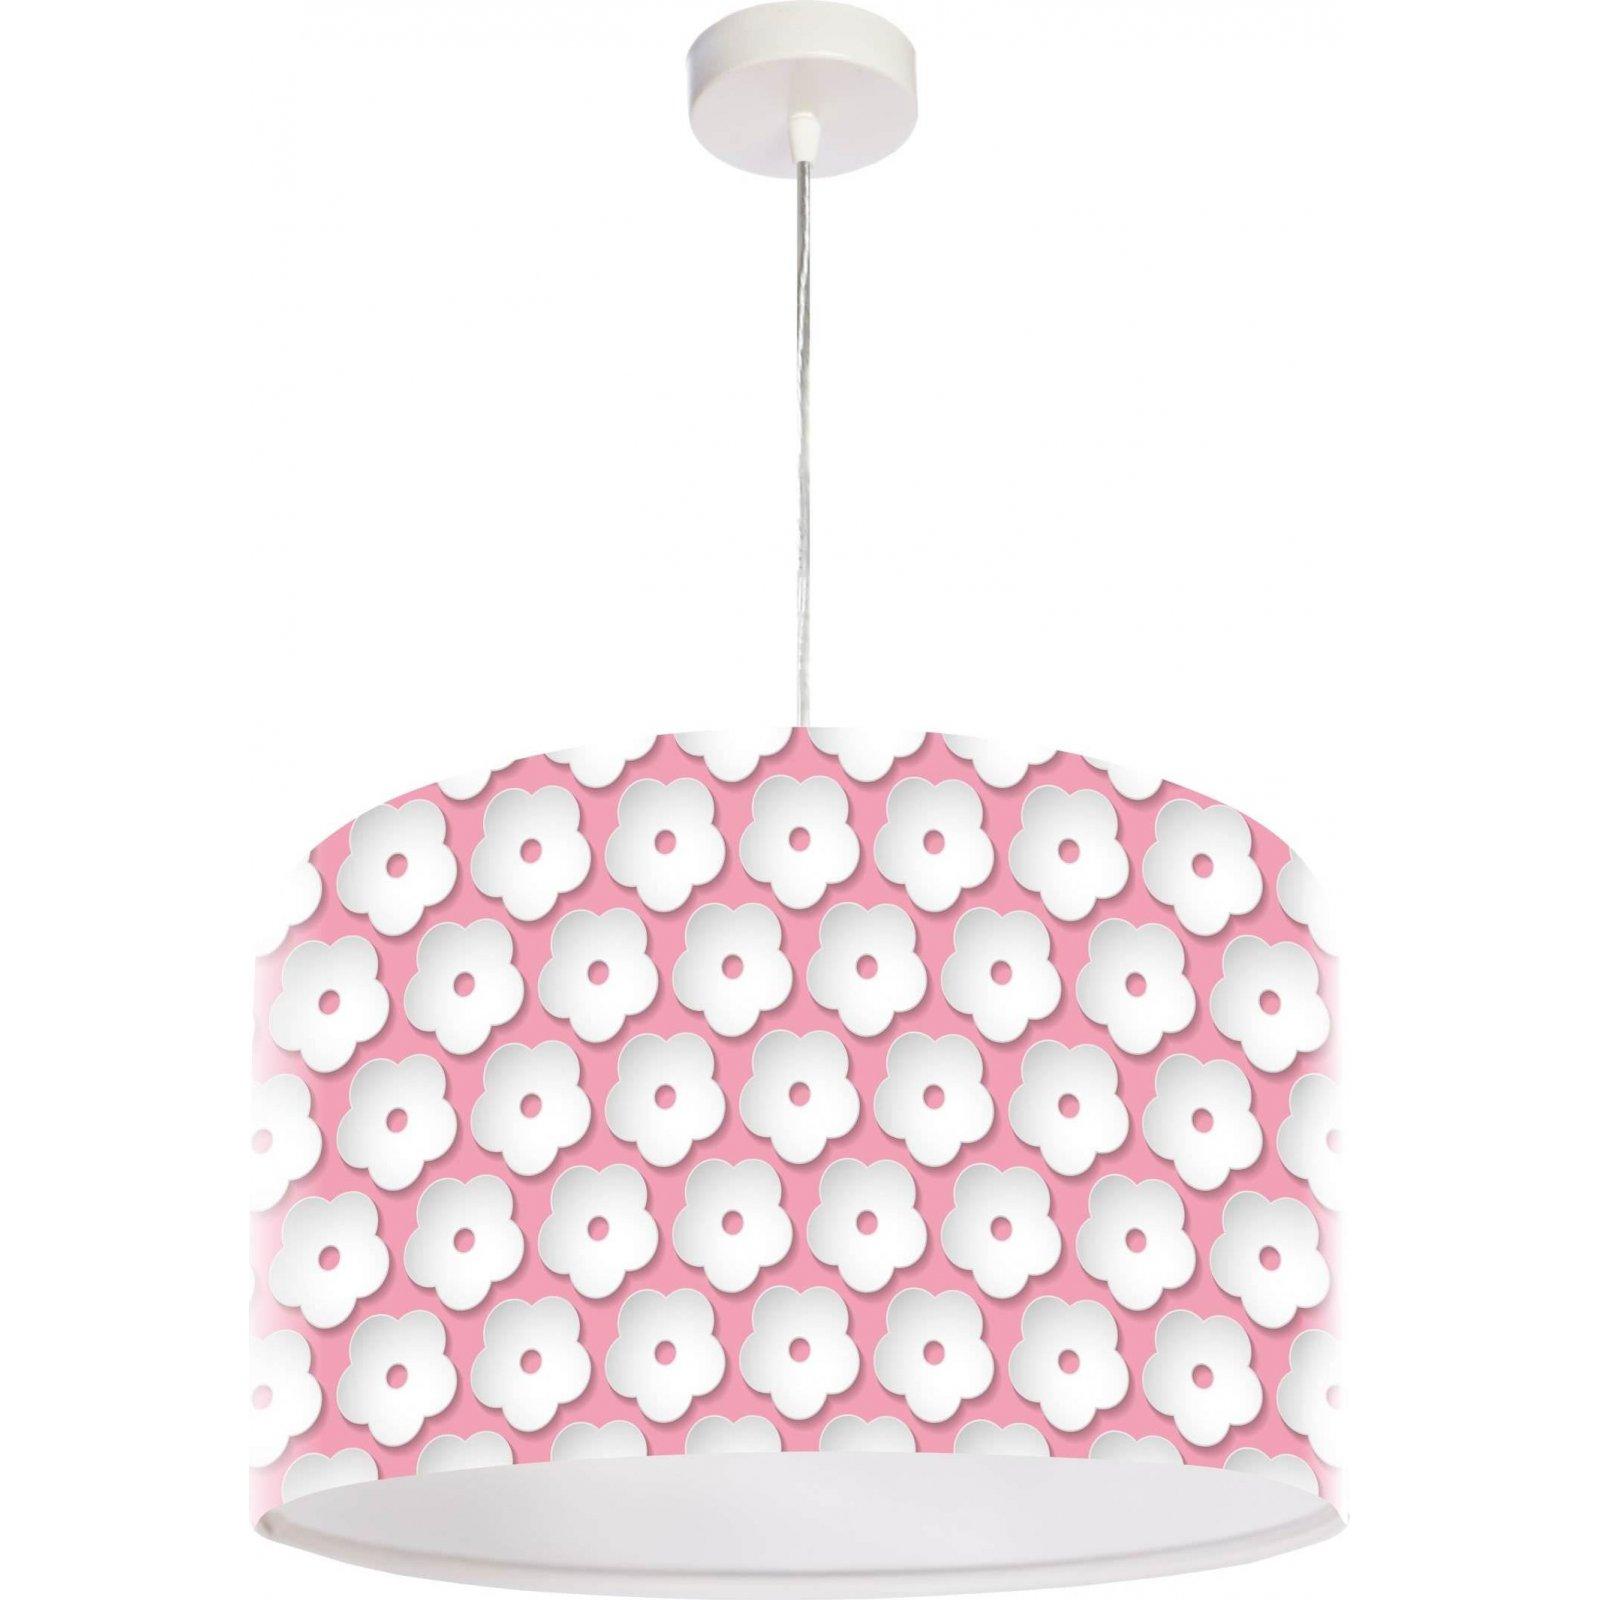 Suspension enfant abat-jour tissu rose et blanc Ø 50